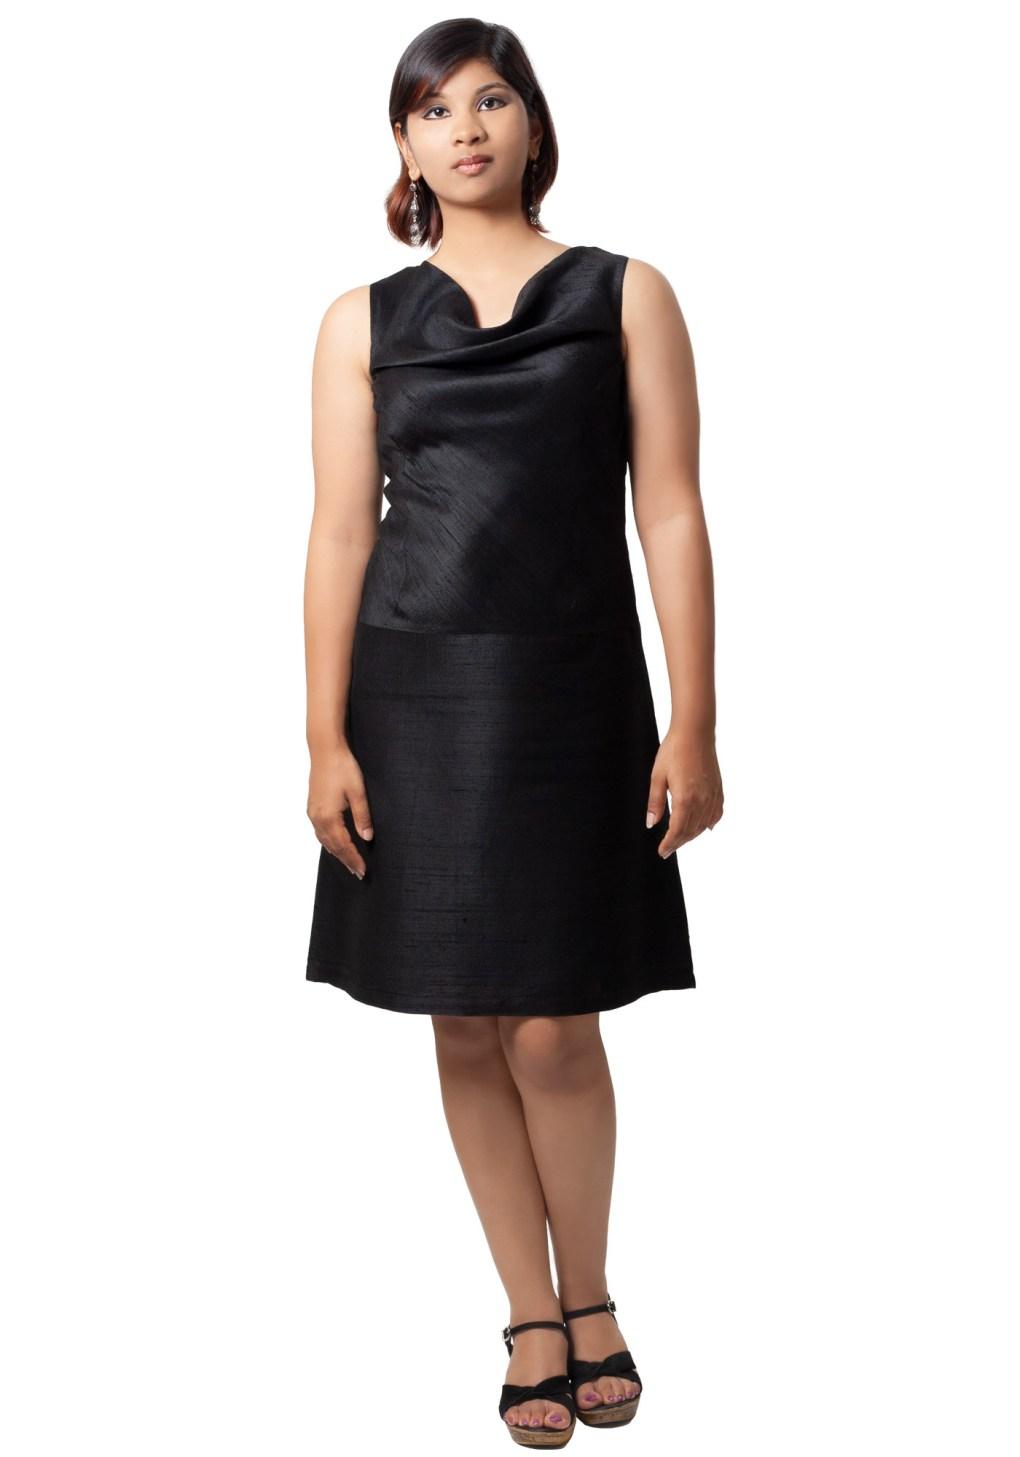 MINC ecofriendly couture Little Black Cowl Neck Dress in Silk